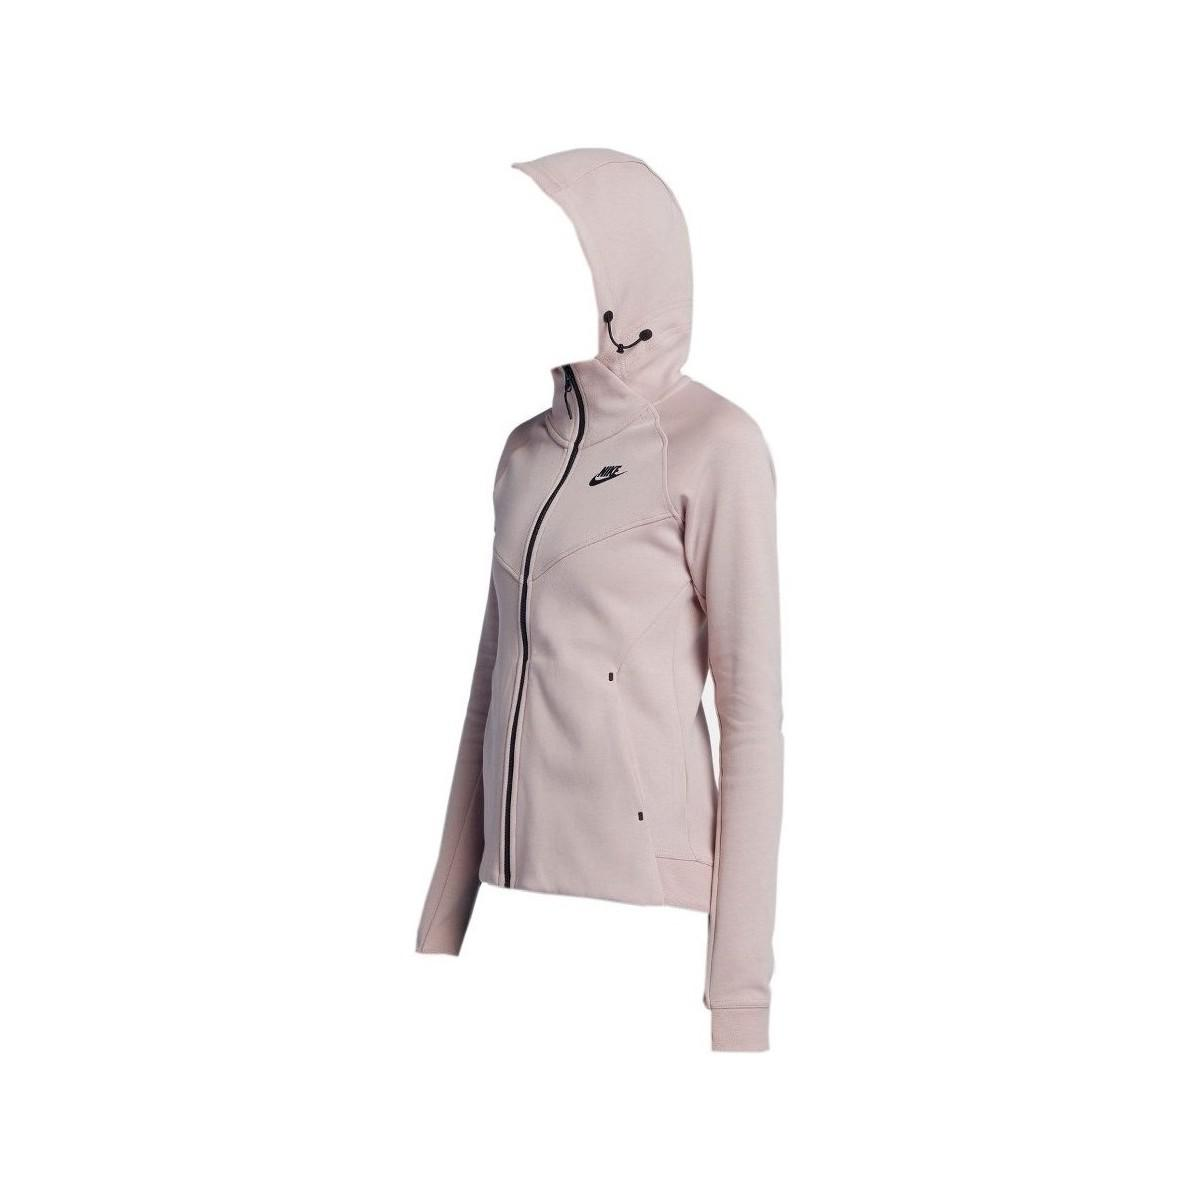 feb56006b92c0 Nike Wmns Nsw Tec Fleece Windrunner Women s Sweatshirt In Pink in ...